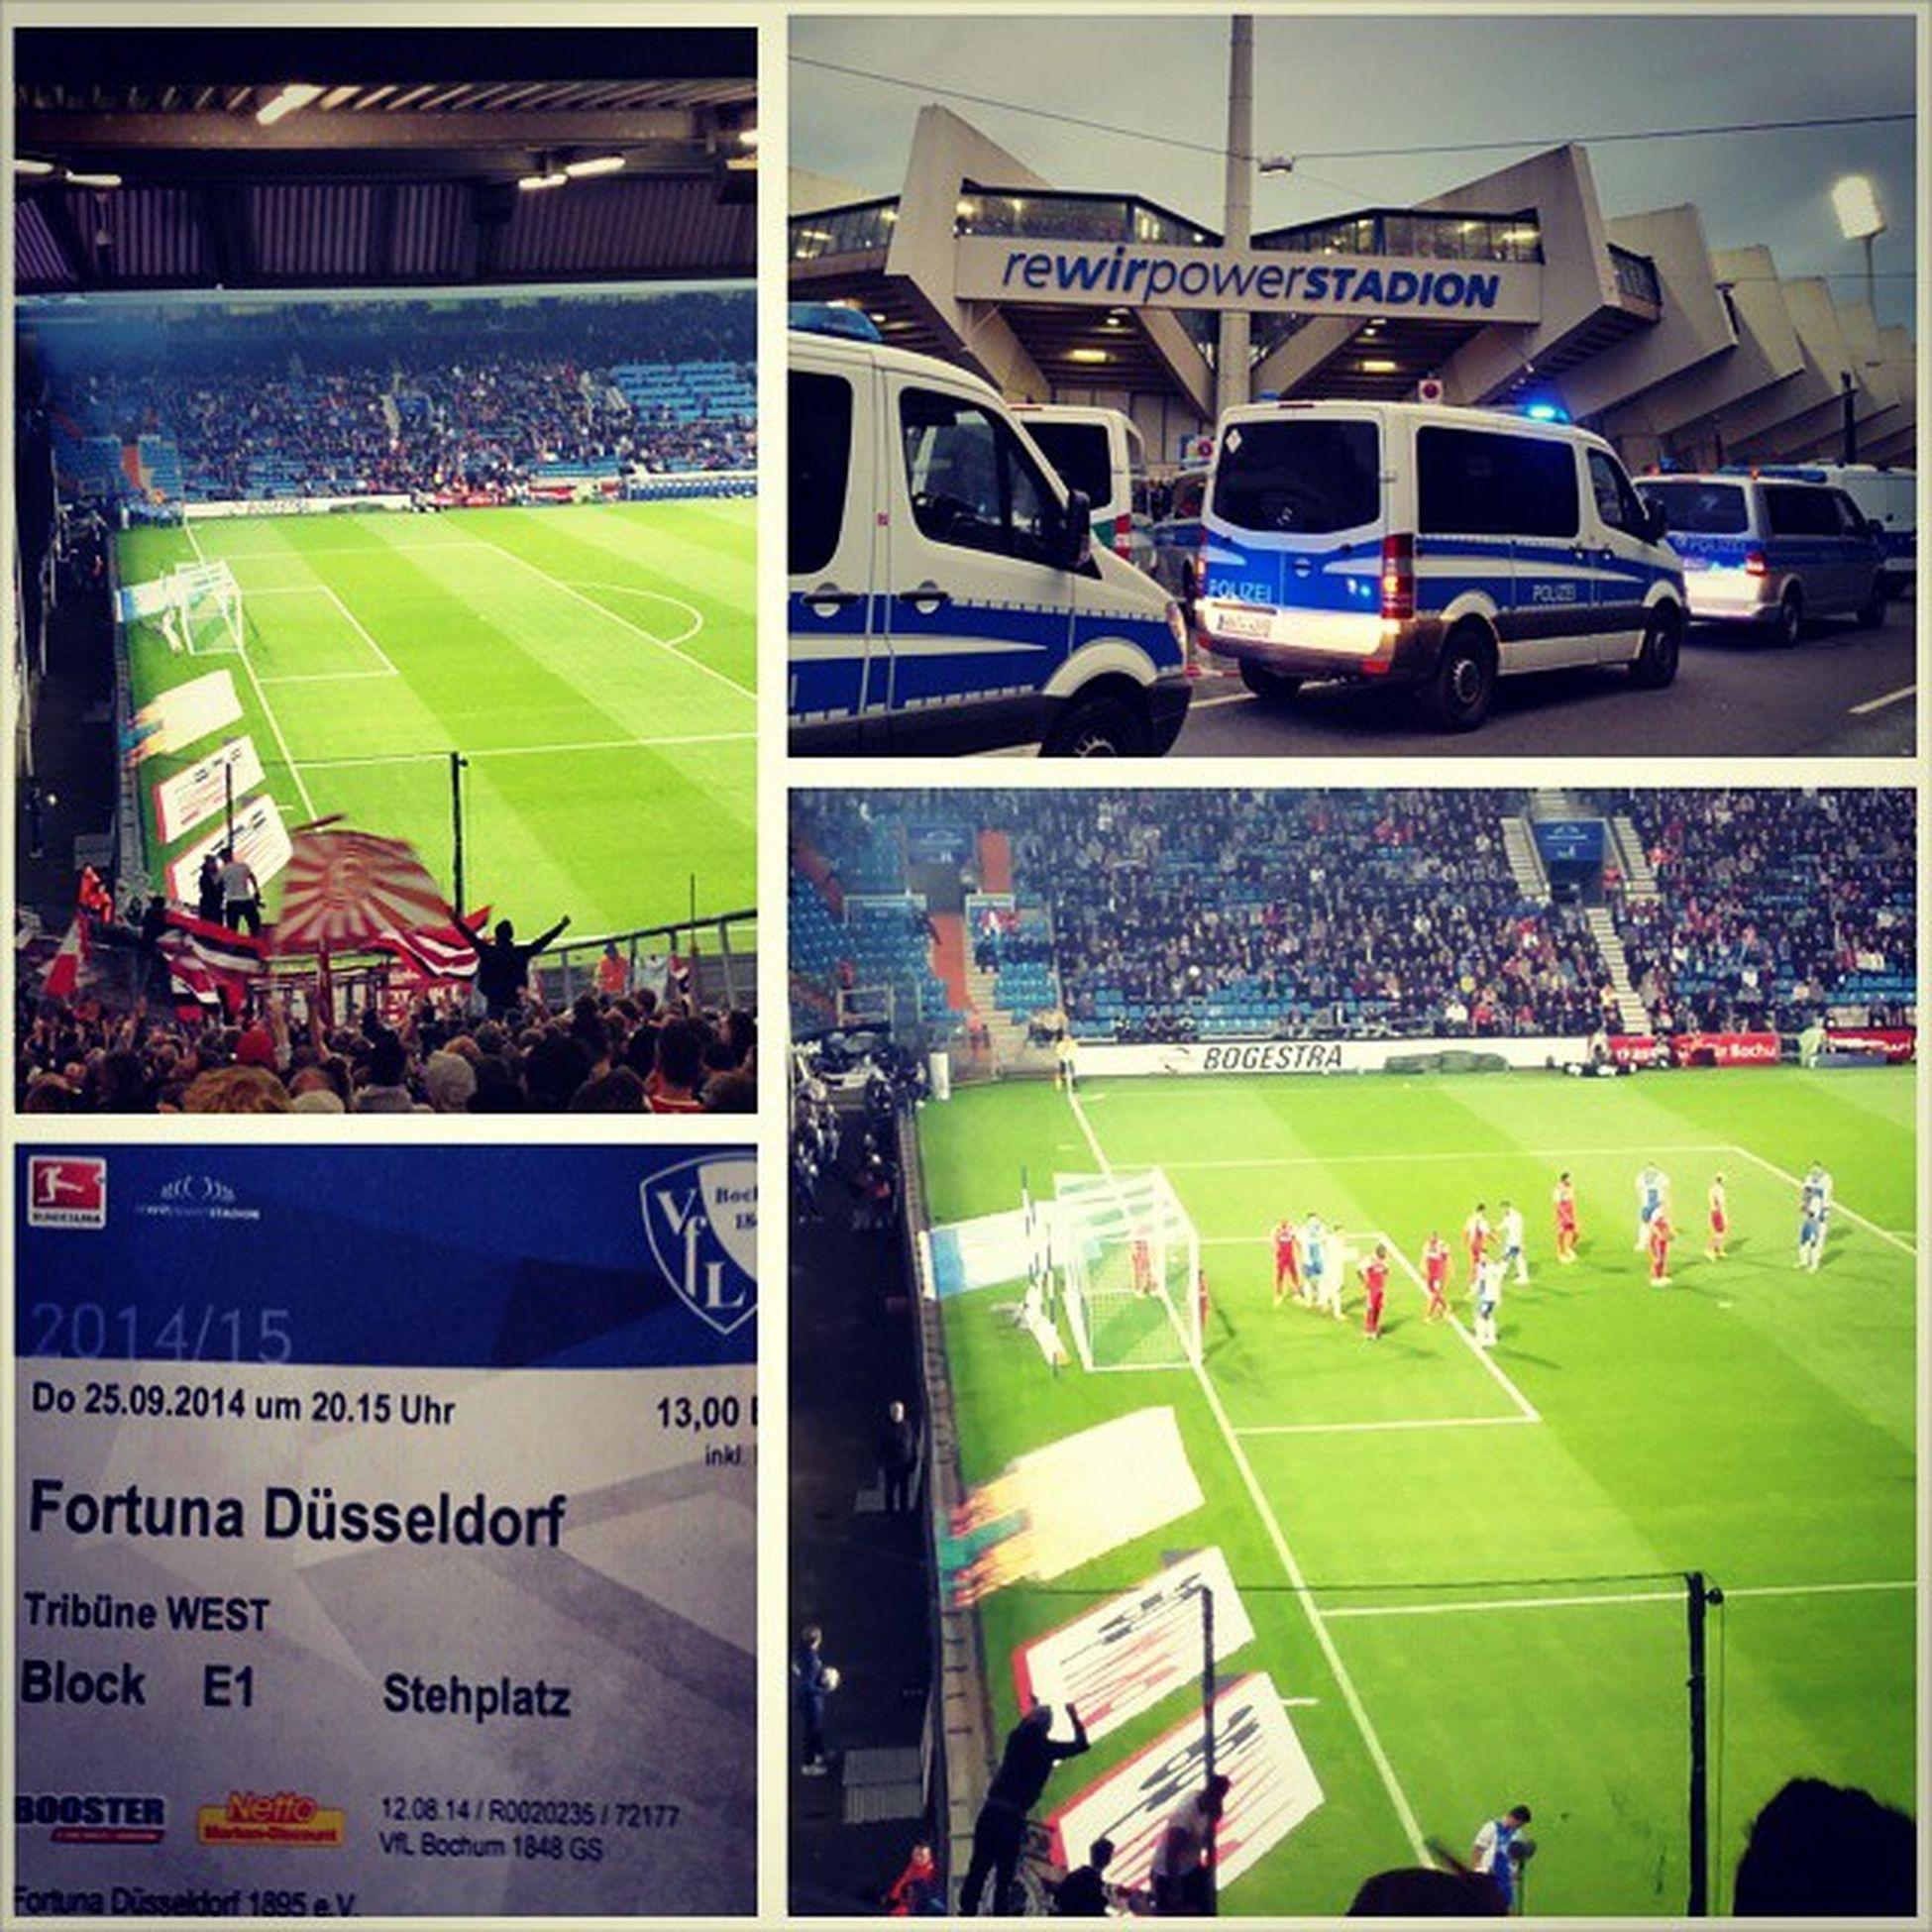 Wieder hundert graue Haare mehr ;-) F95 LigaZwei Bundesliga UD2000 Ultras SCD2003 Fussball